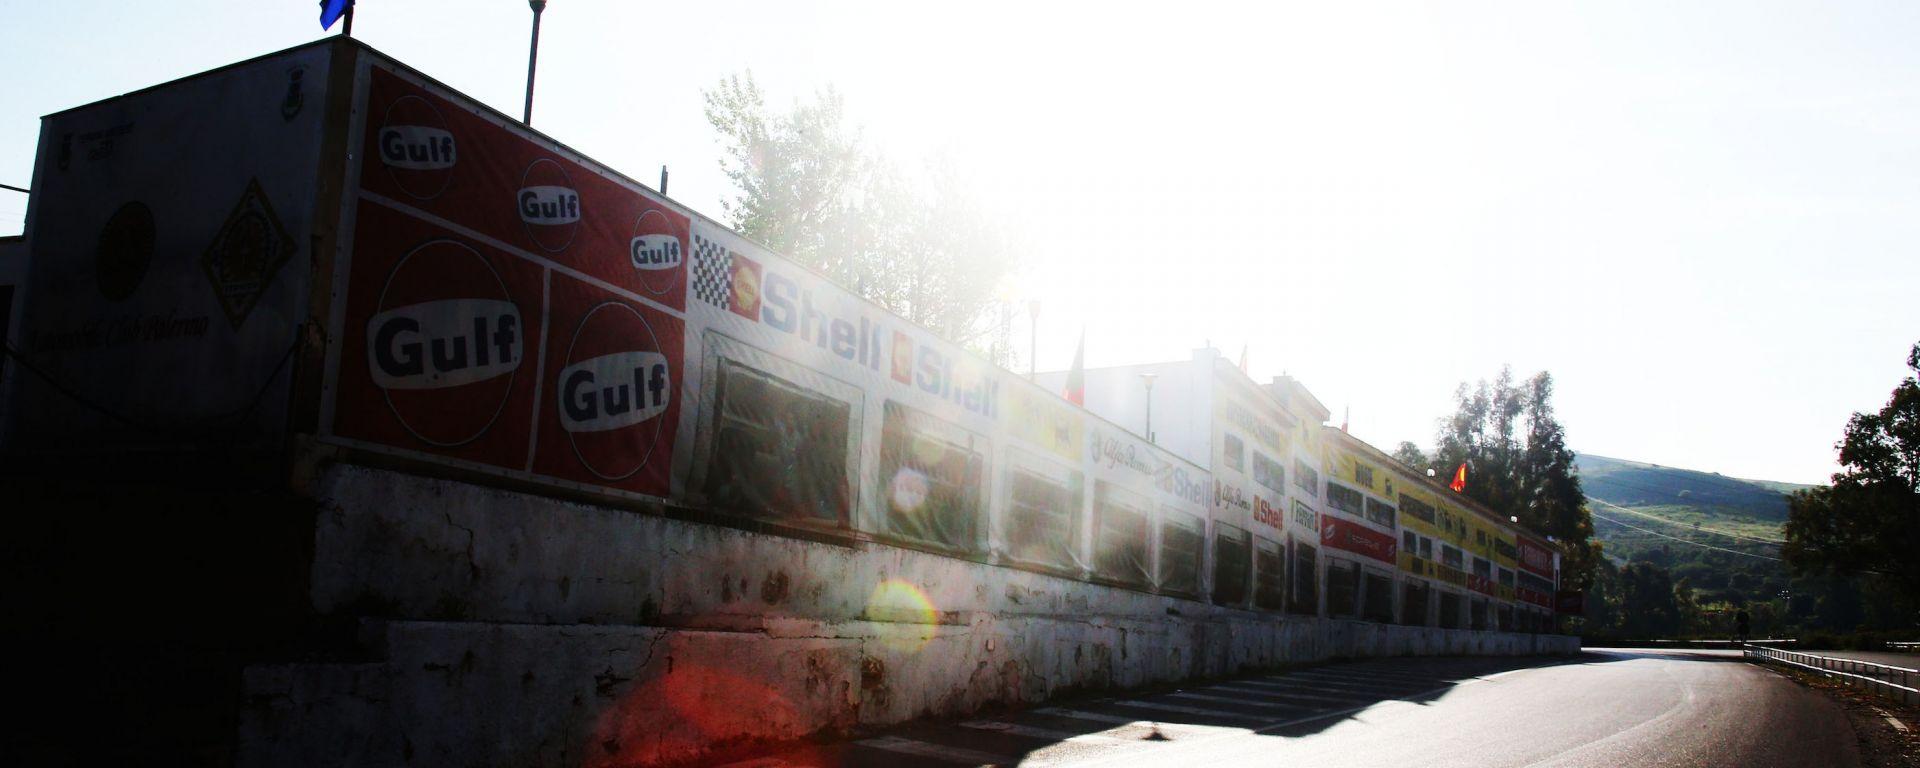 Le strade della Targa Florio